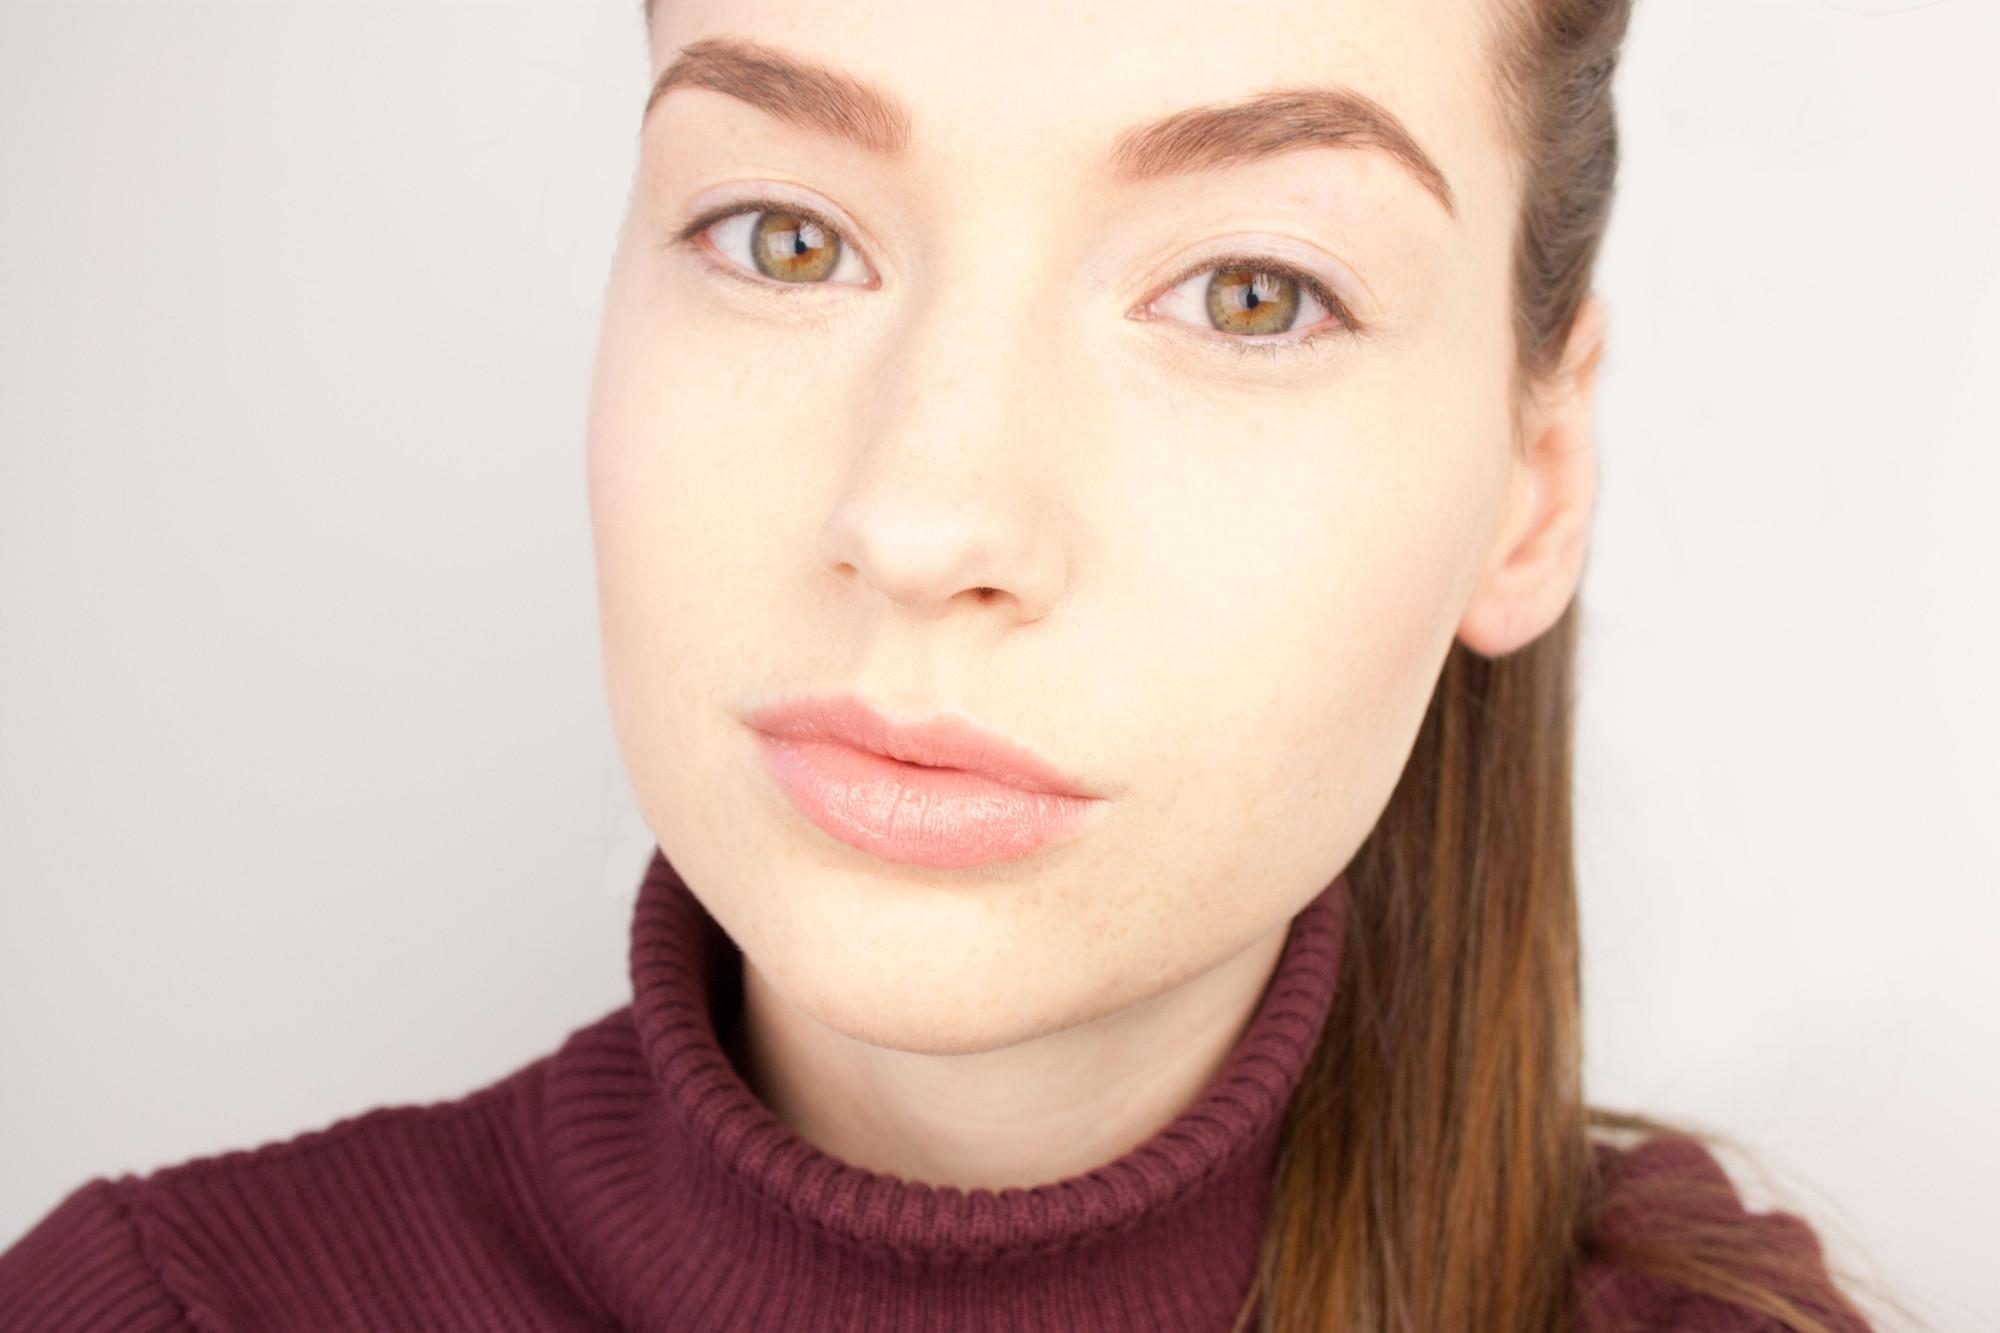 Review Eyeshadow Palette 15 Warm - Zonder Make-up